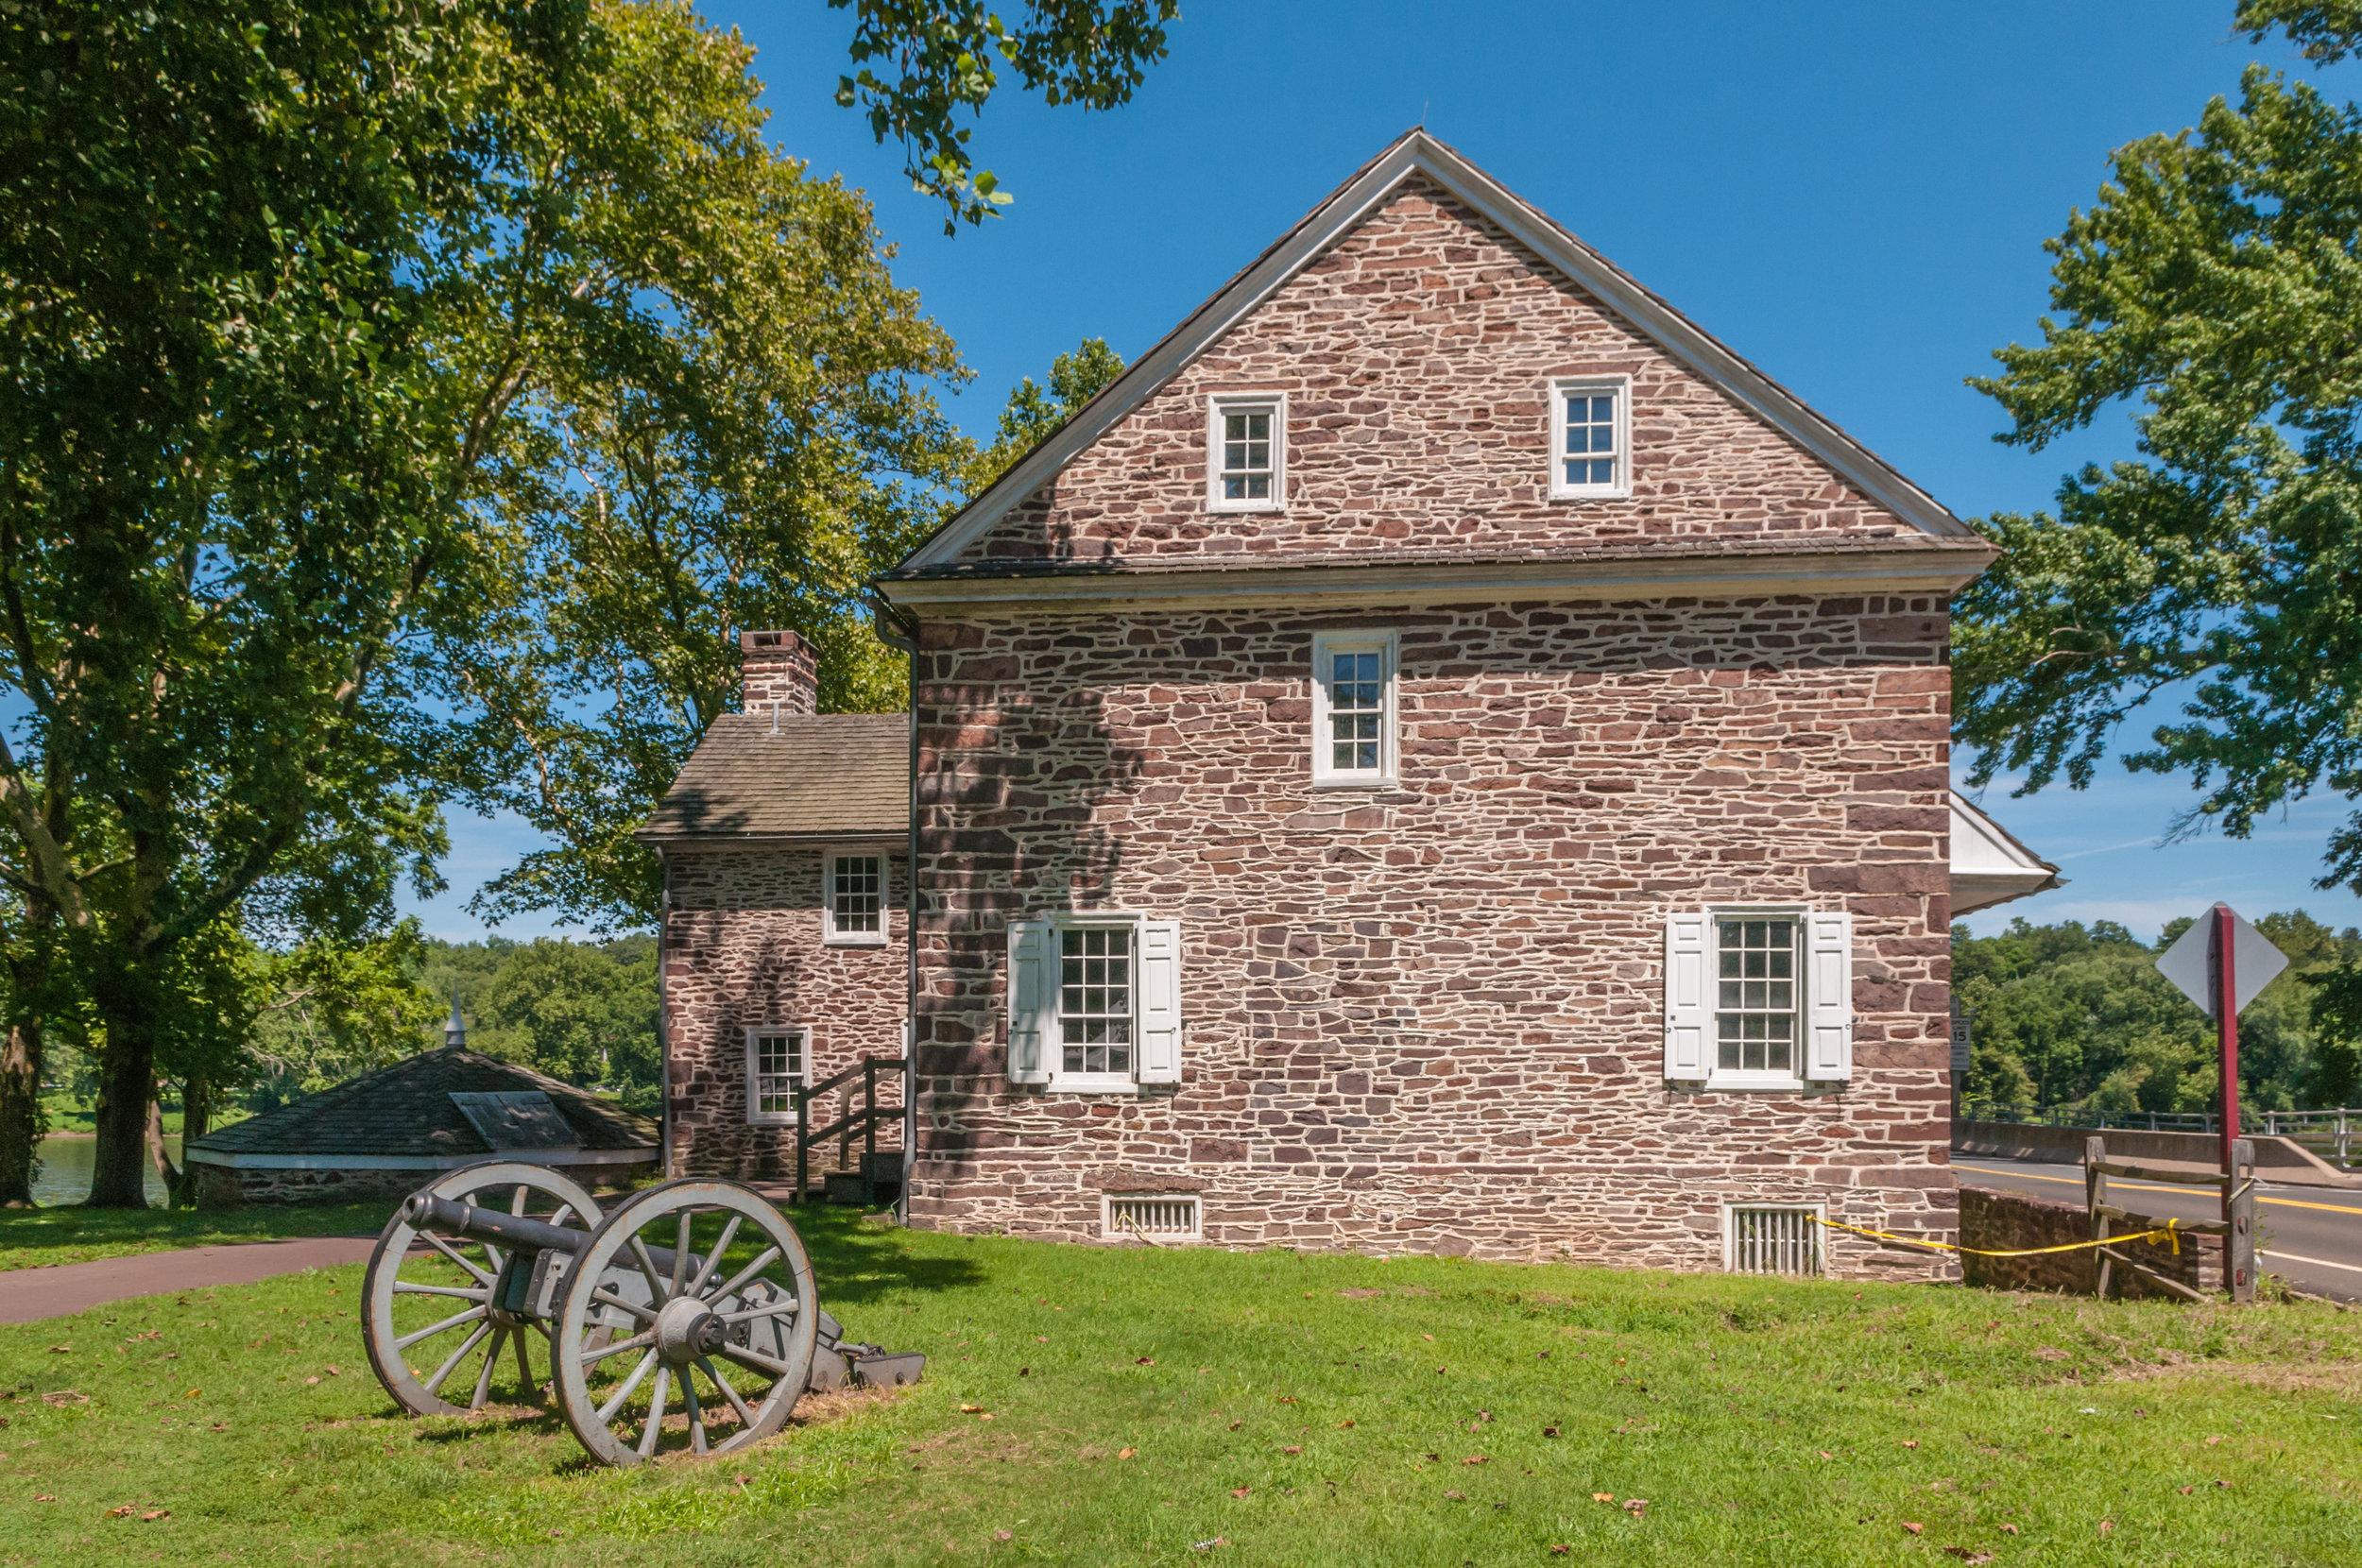 Washington Crossing Historic Park, Site Improvements, Restoration & Rehabilitation